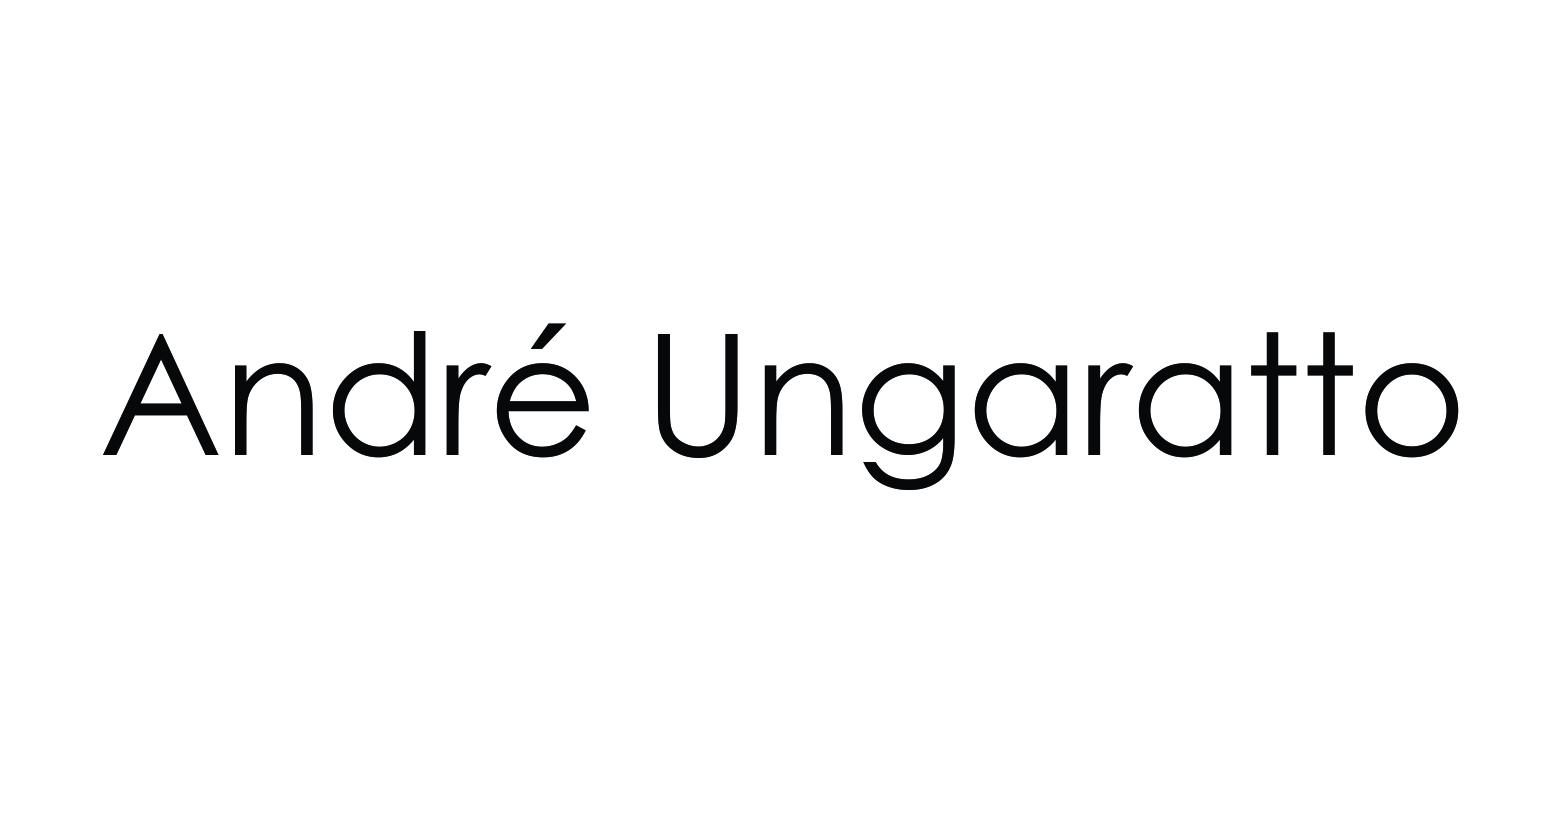 André Ungaratto